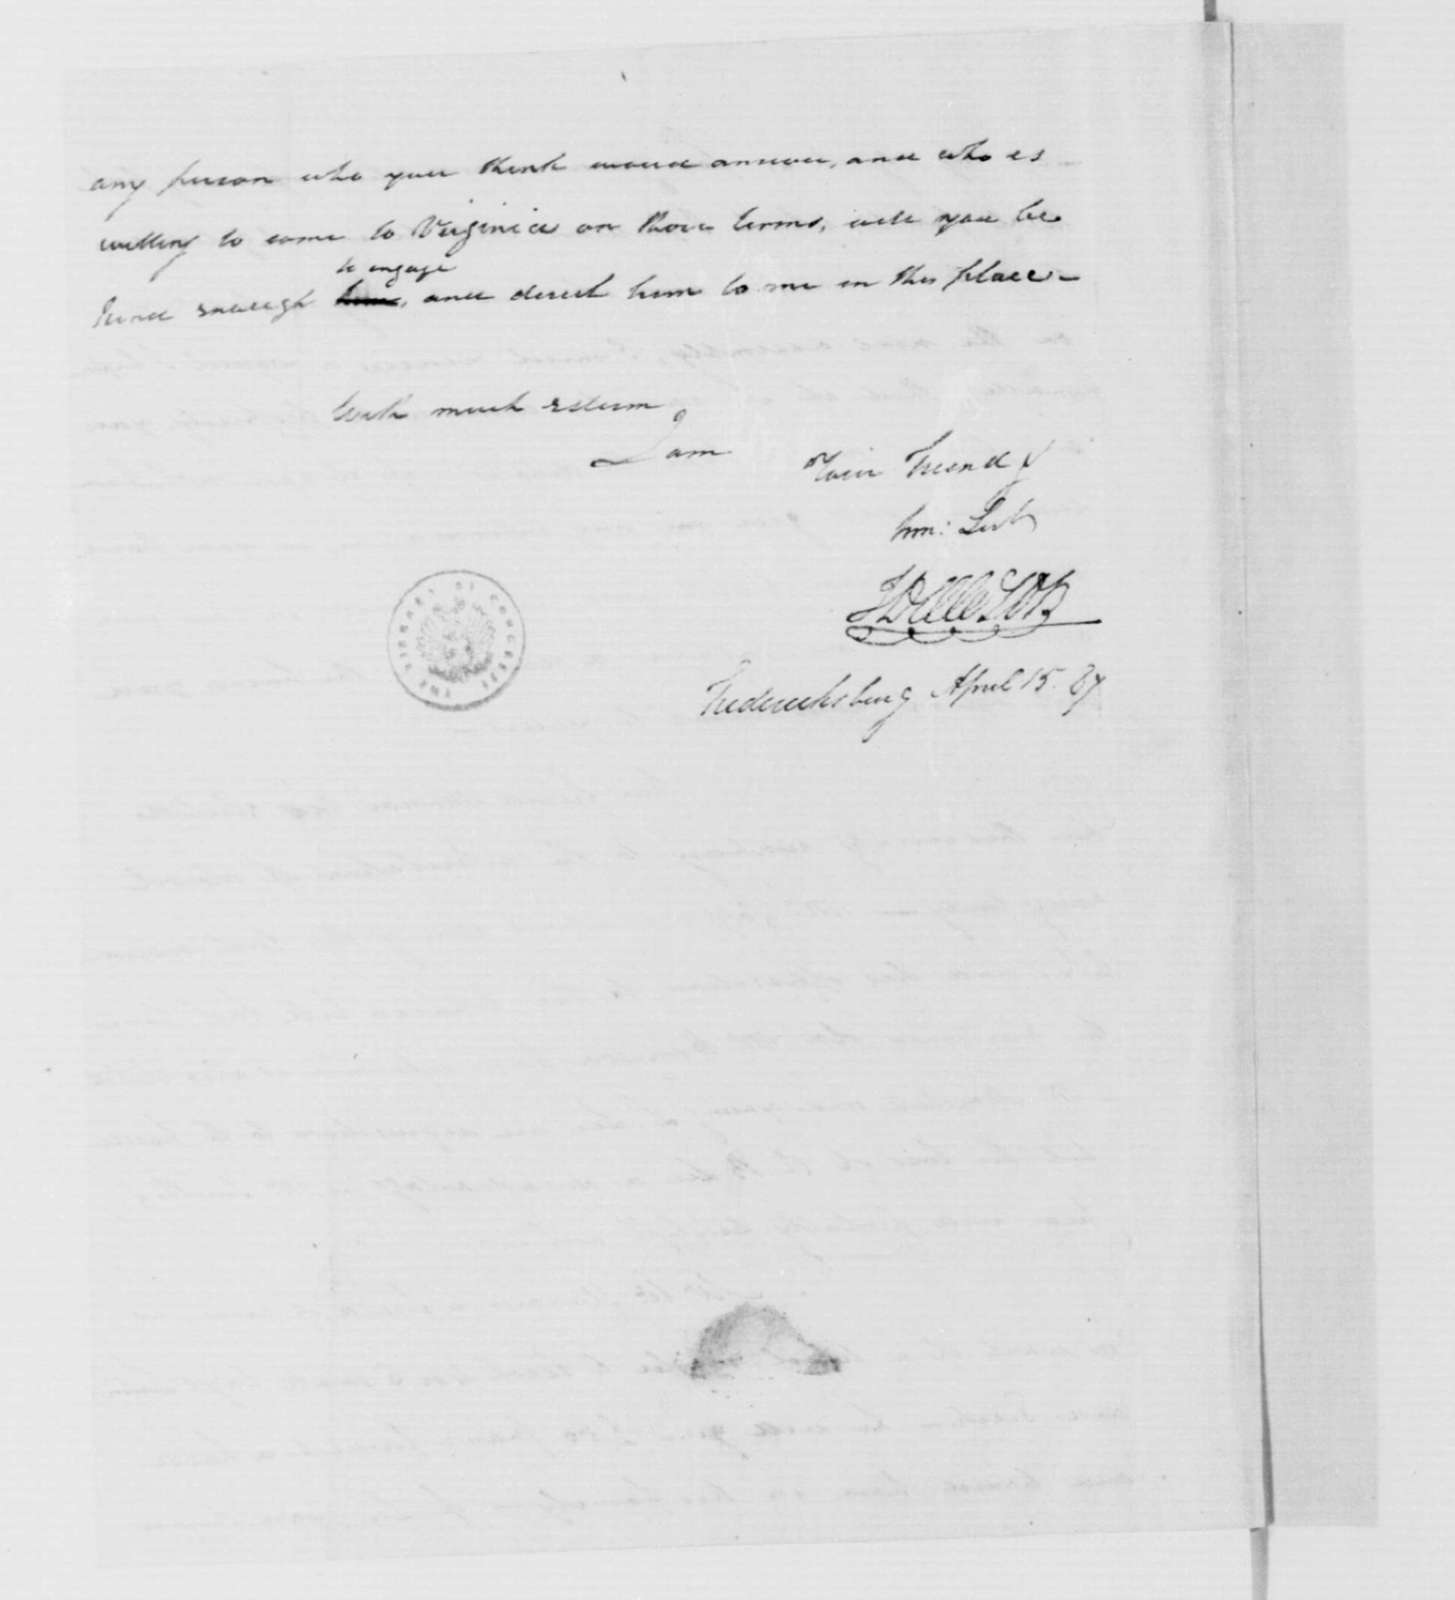 John Dawson to James Madison, April 15, 1787.